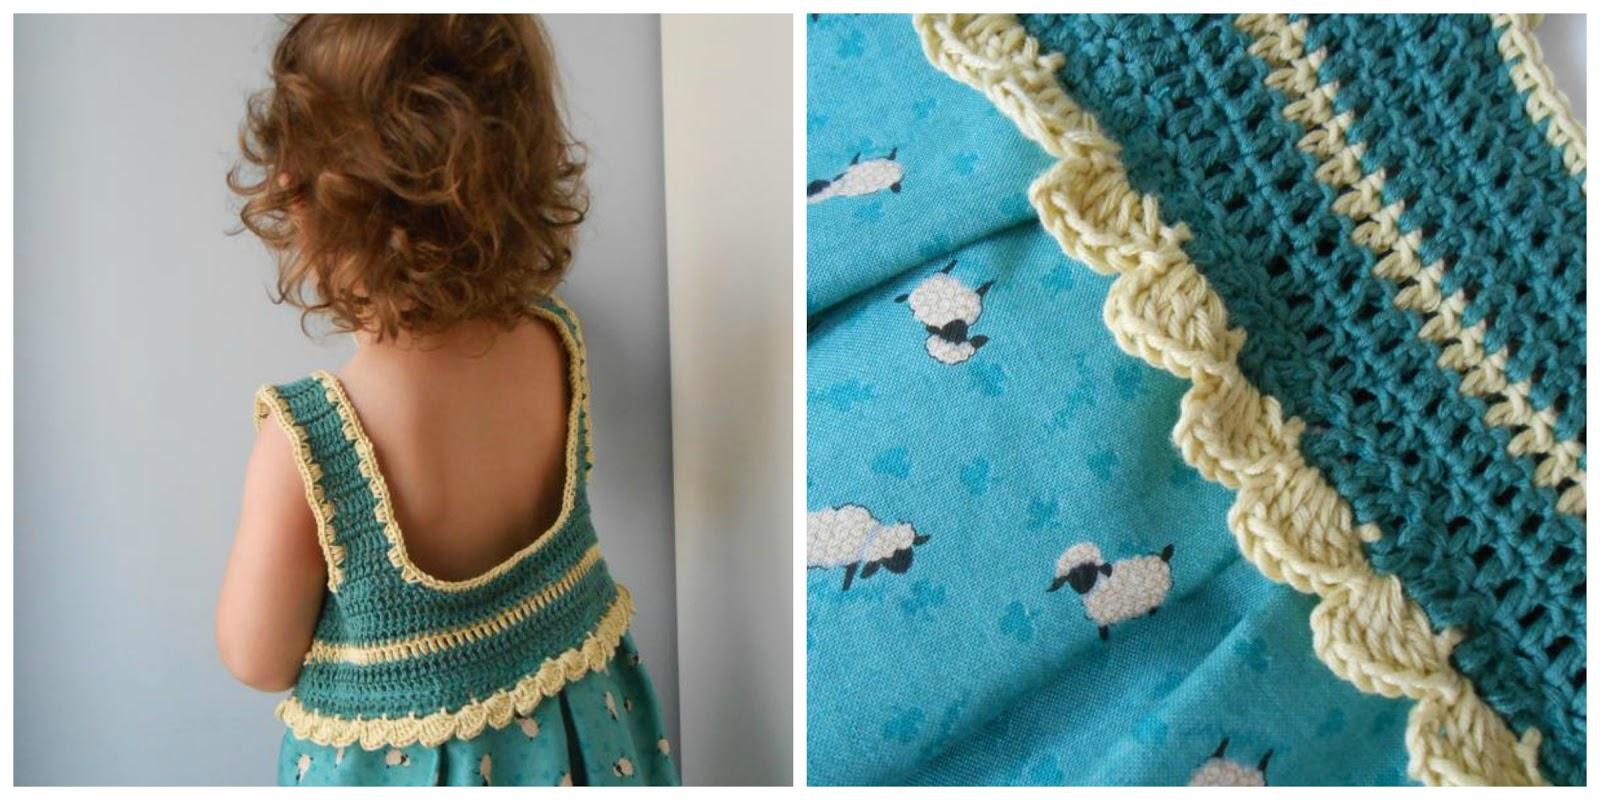 Crochet Materials : love the crochet dress with the lambs ... I looooooove.... looooove ...